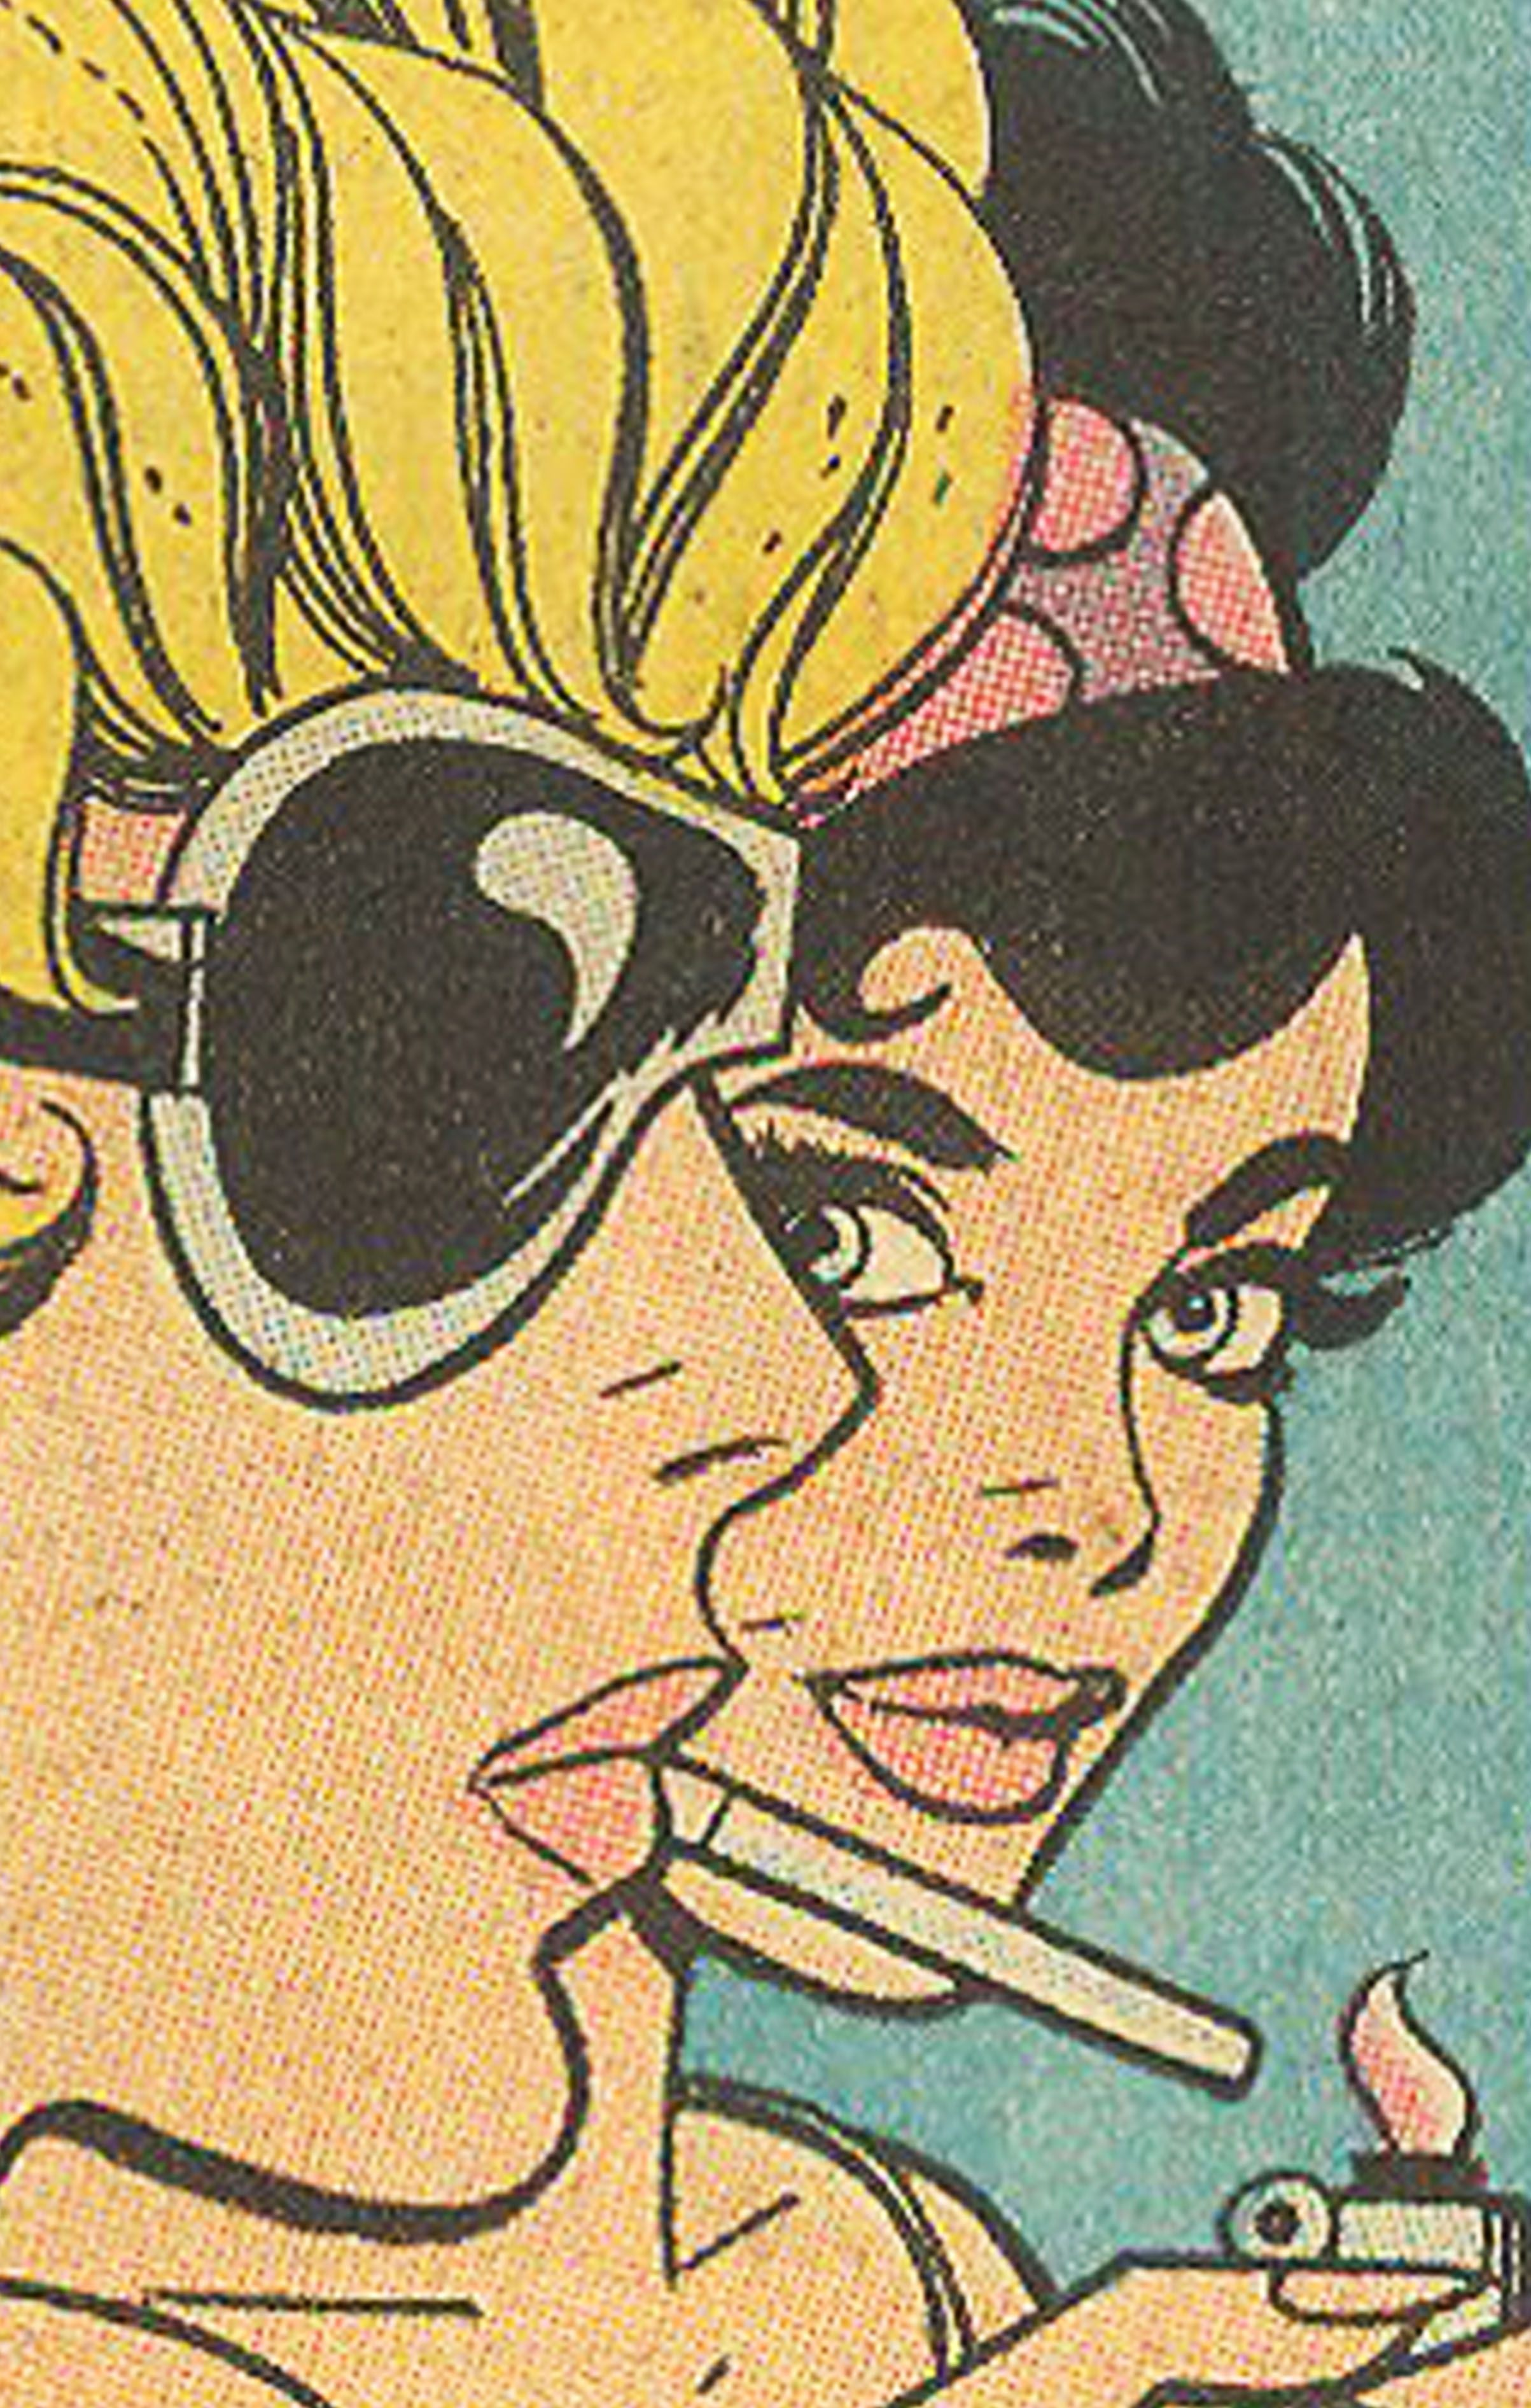 1000 images about comics on pinterest pop art skottie young and vintage comics. Black Bedroom Furniture Sets. Home Design Ideas